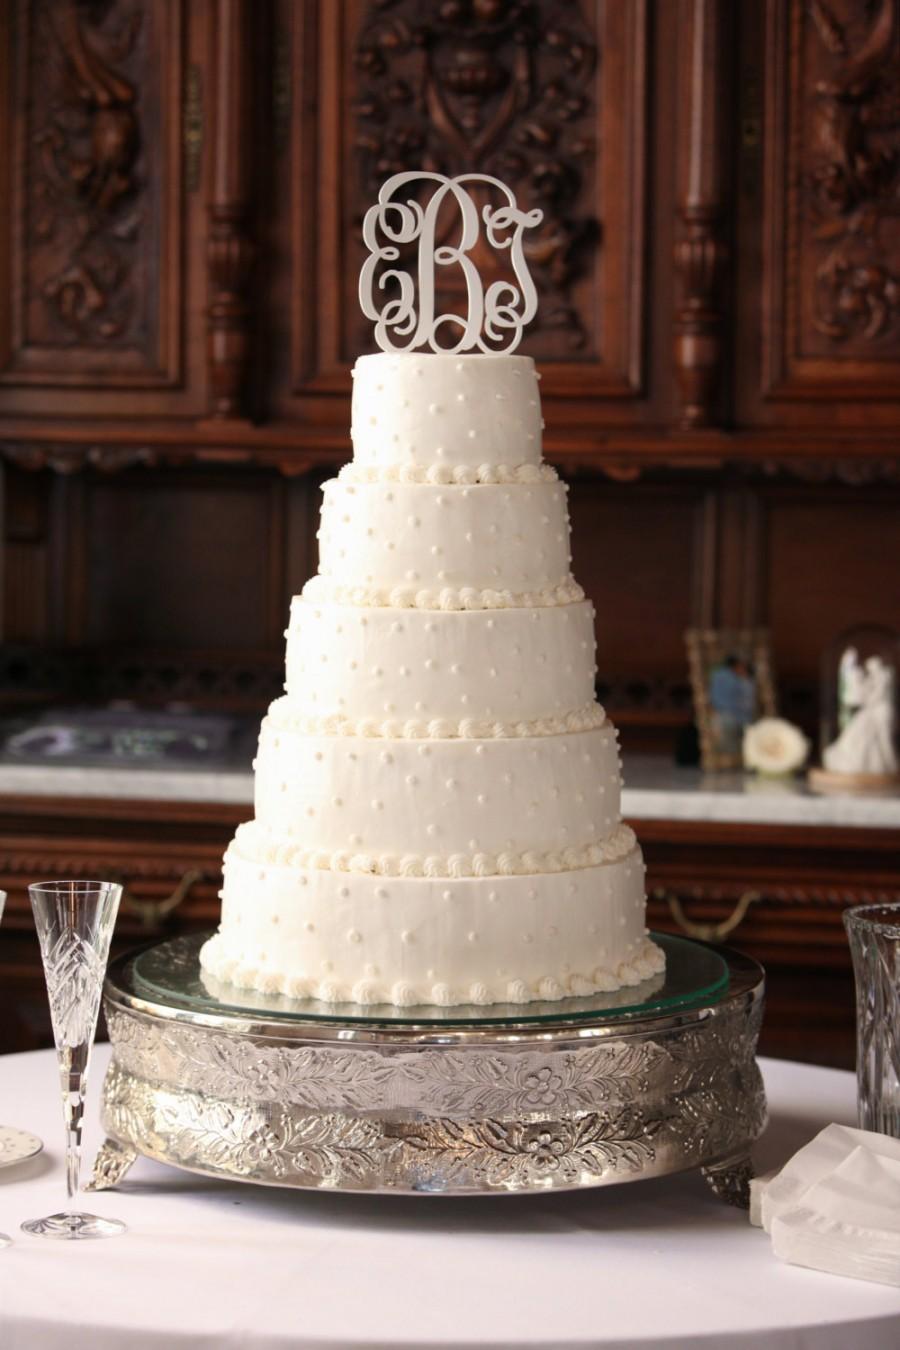 Hochzeit - Monogram Cake Topper - Personalized Cake Topper - Bride's Cake - Initial Cake Topper - Painted